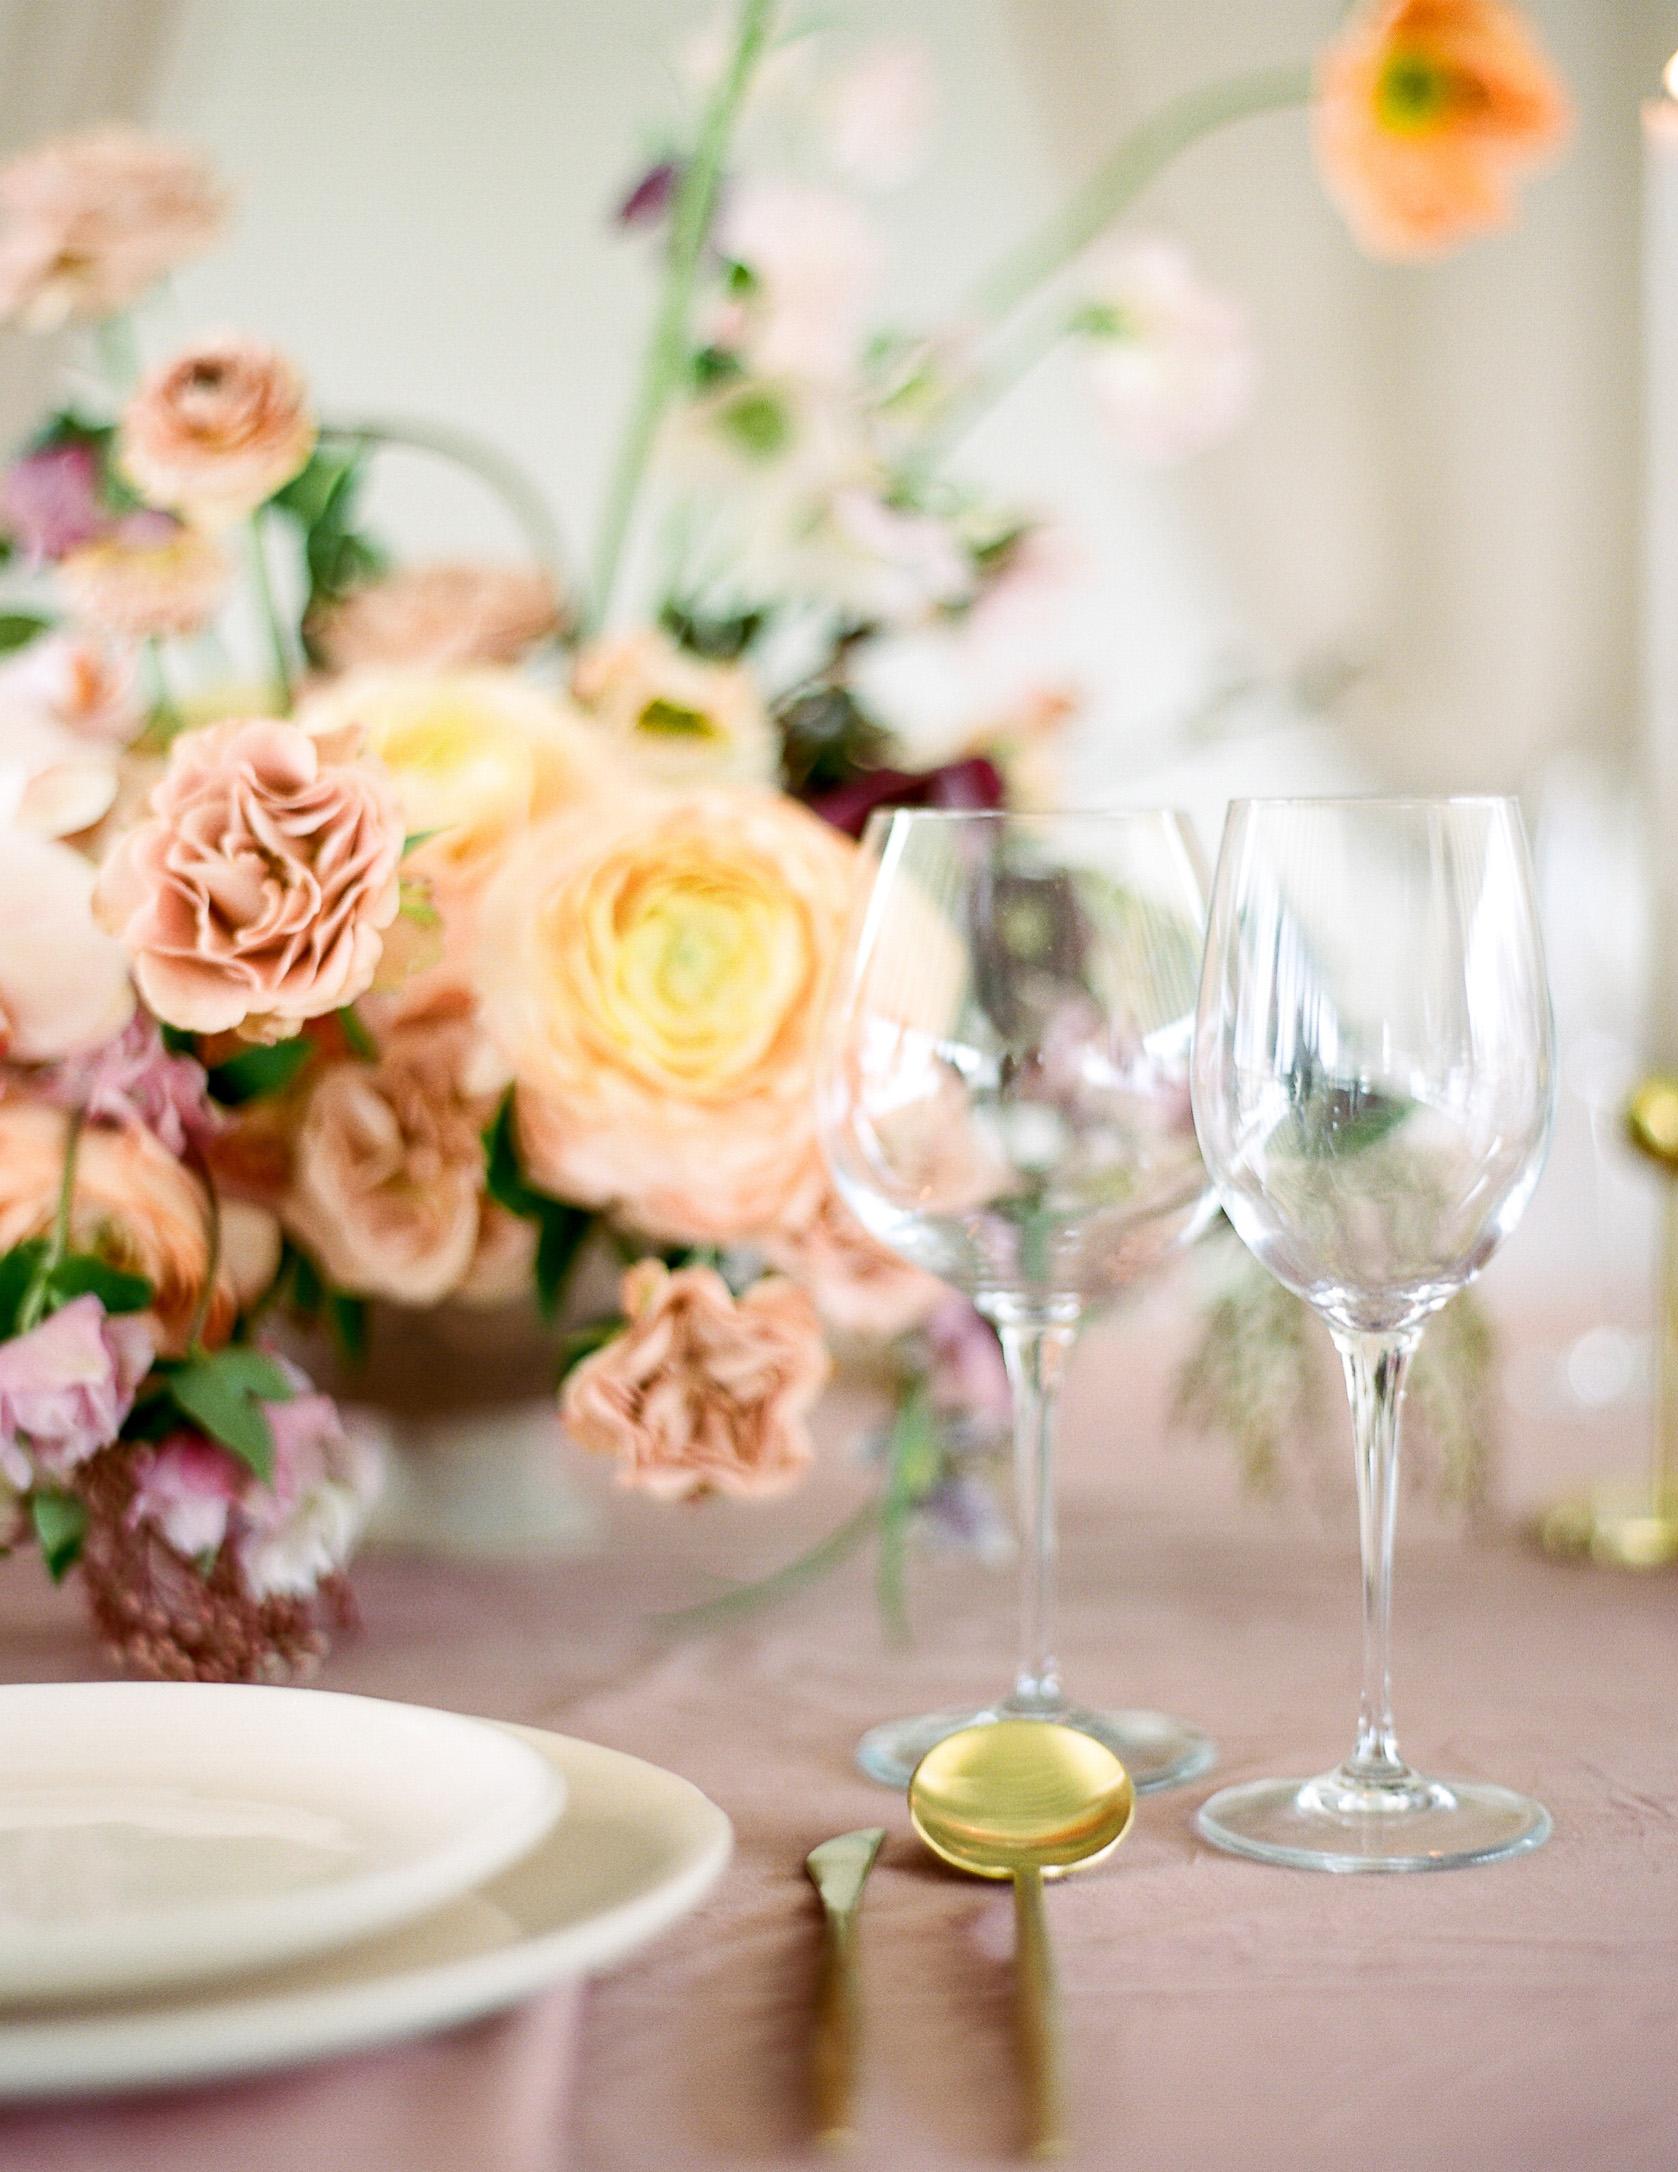 Austin-Wedding-Photography-Prospect-House-Fine-Art-Film-Destination-Dana-Josh-Fernandez-Photography-Dallas-Houston-Luxury-Best-Top-206.jpg